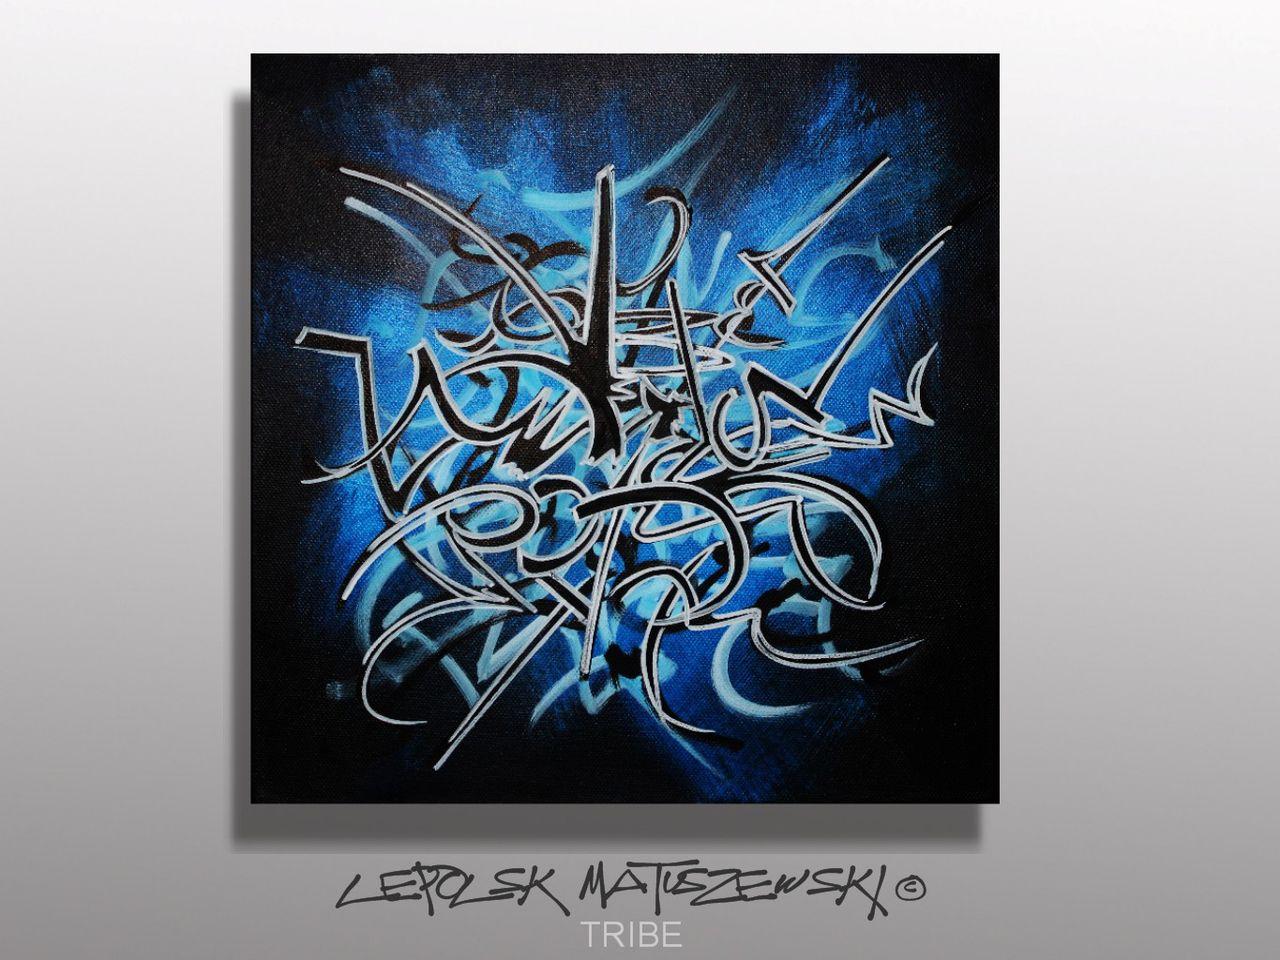 MK  Lepolsk Matuszewski TRIBE  street art calligraffiti graffiti abstrait